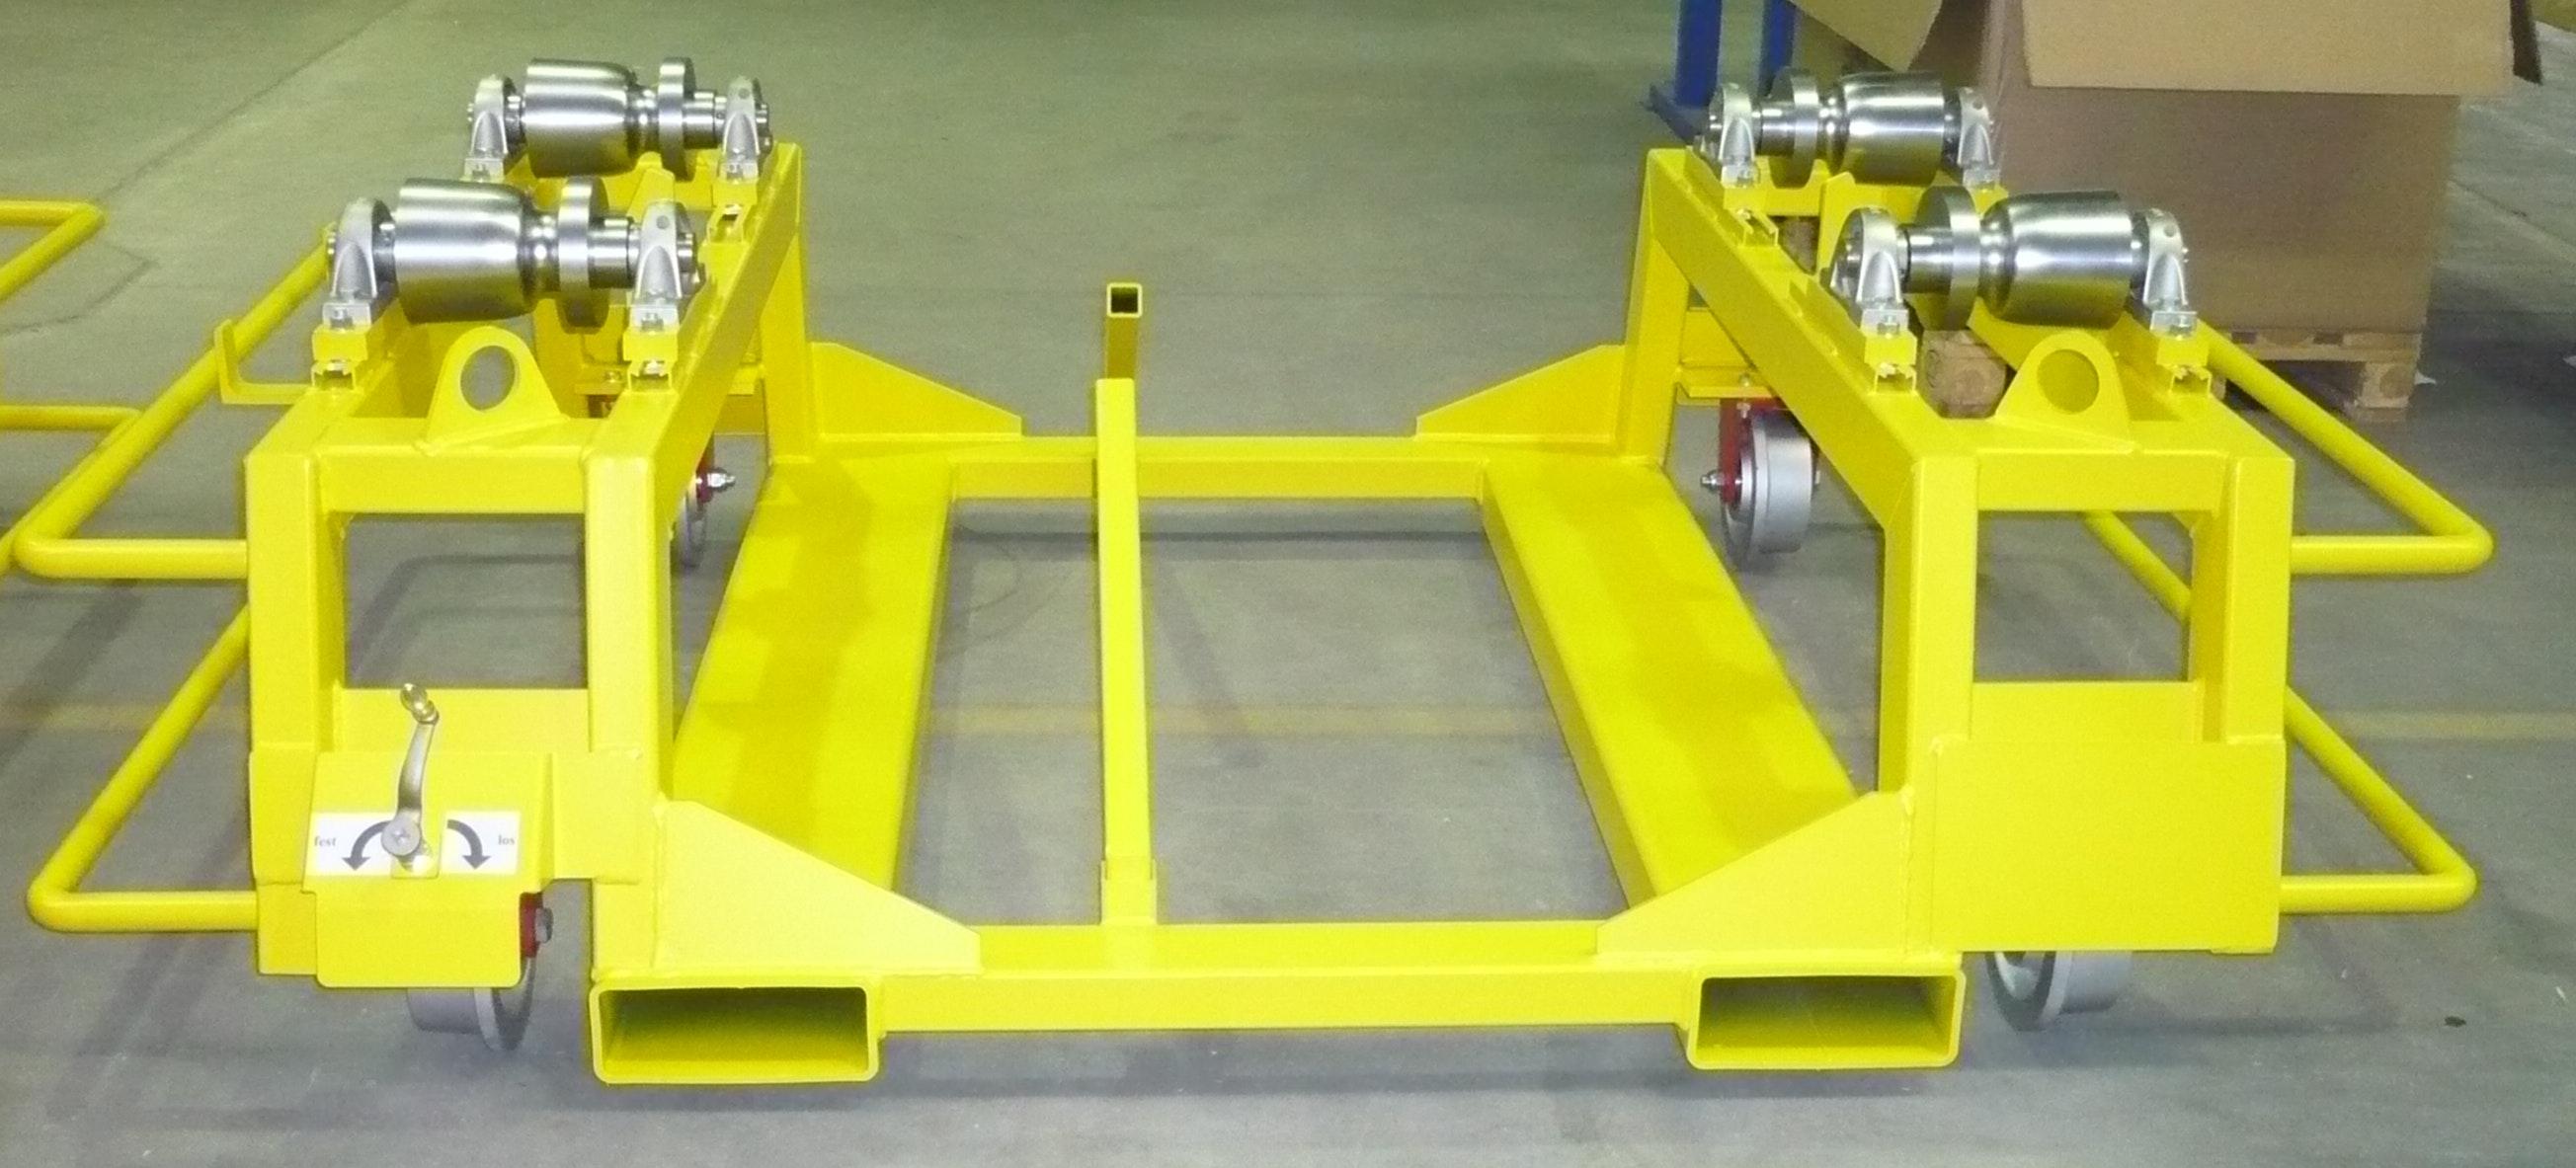 Transport rack for drive wheelsets suitable for rail transport